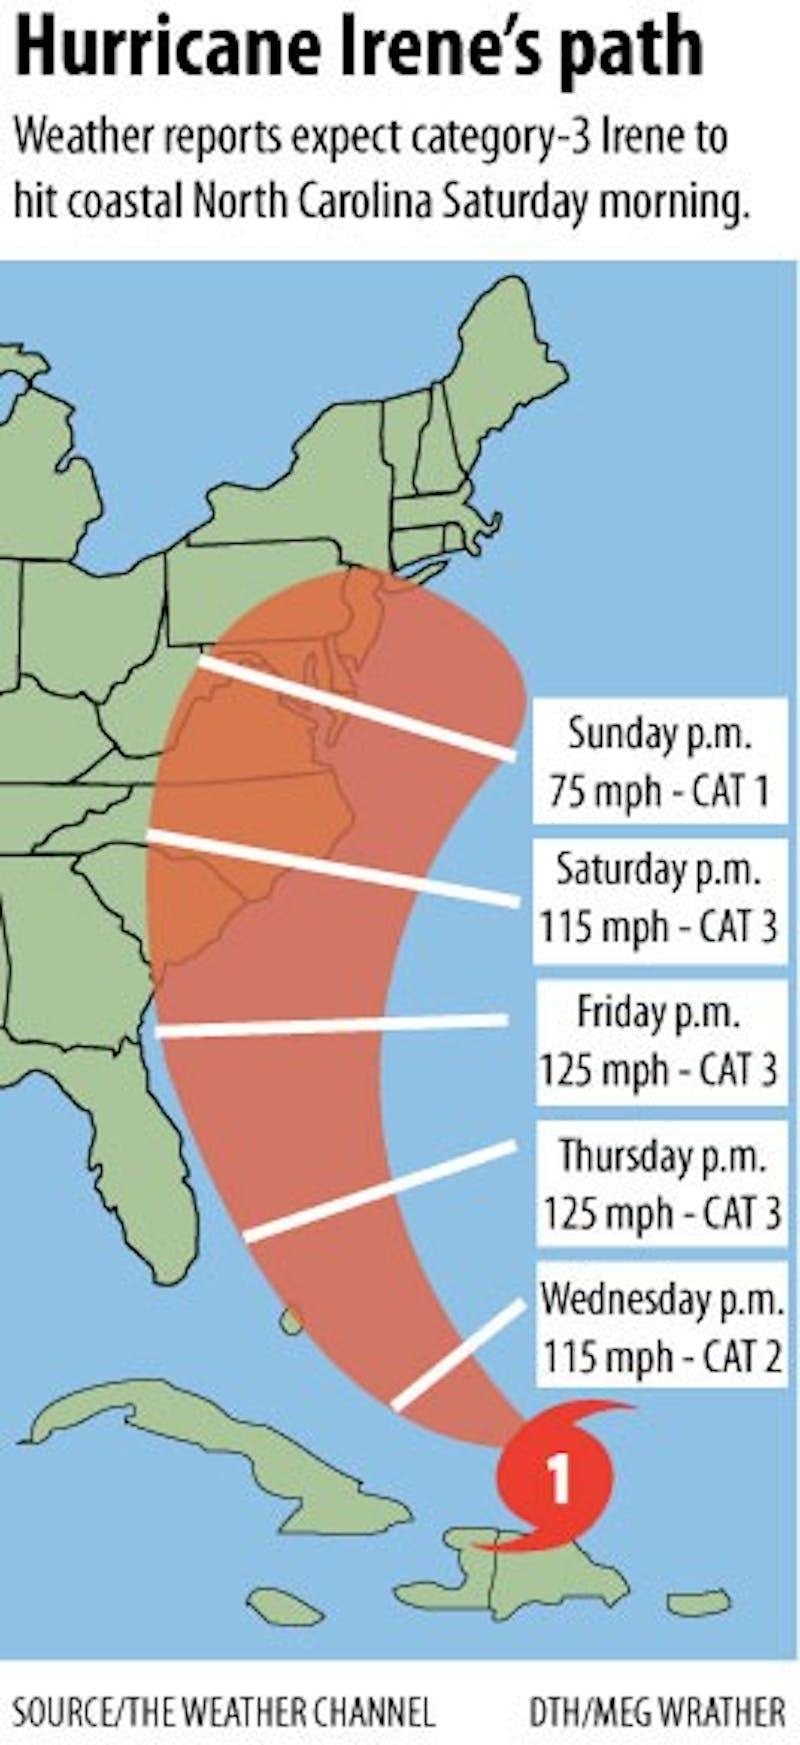 Hurricane Irene to hit East coast